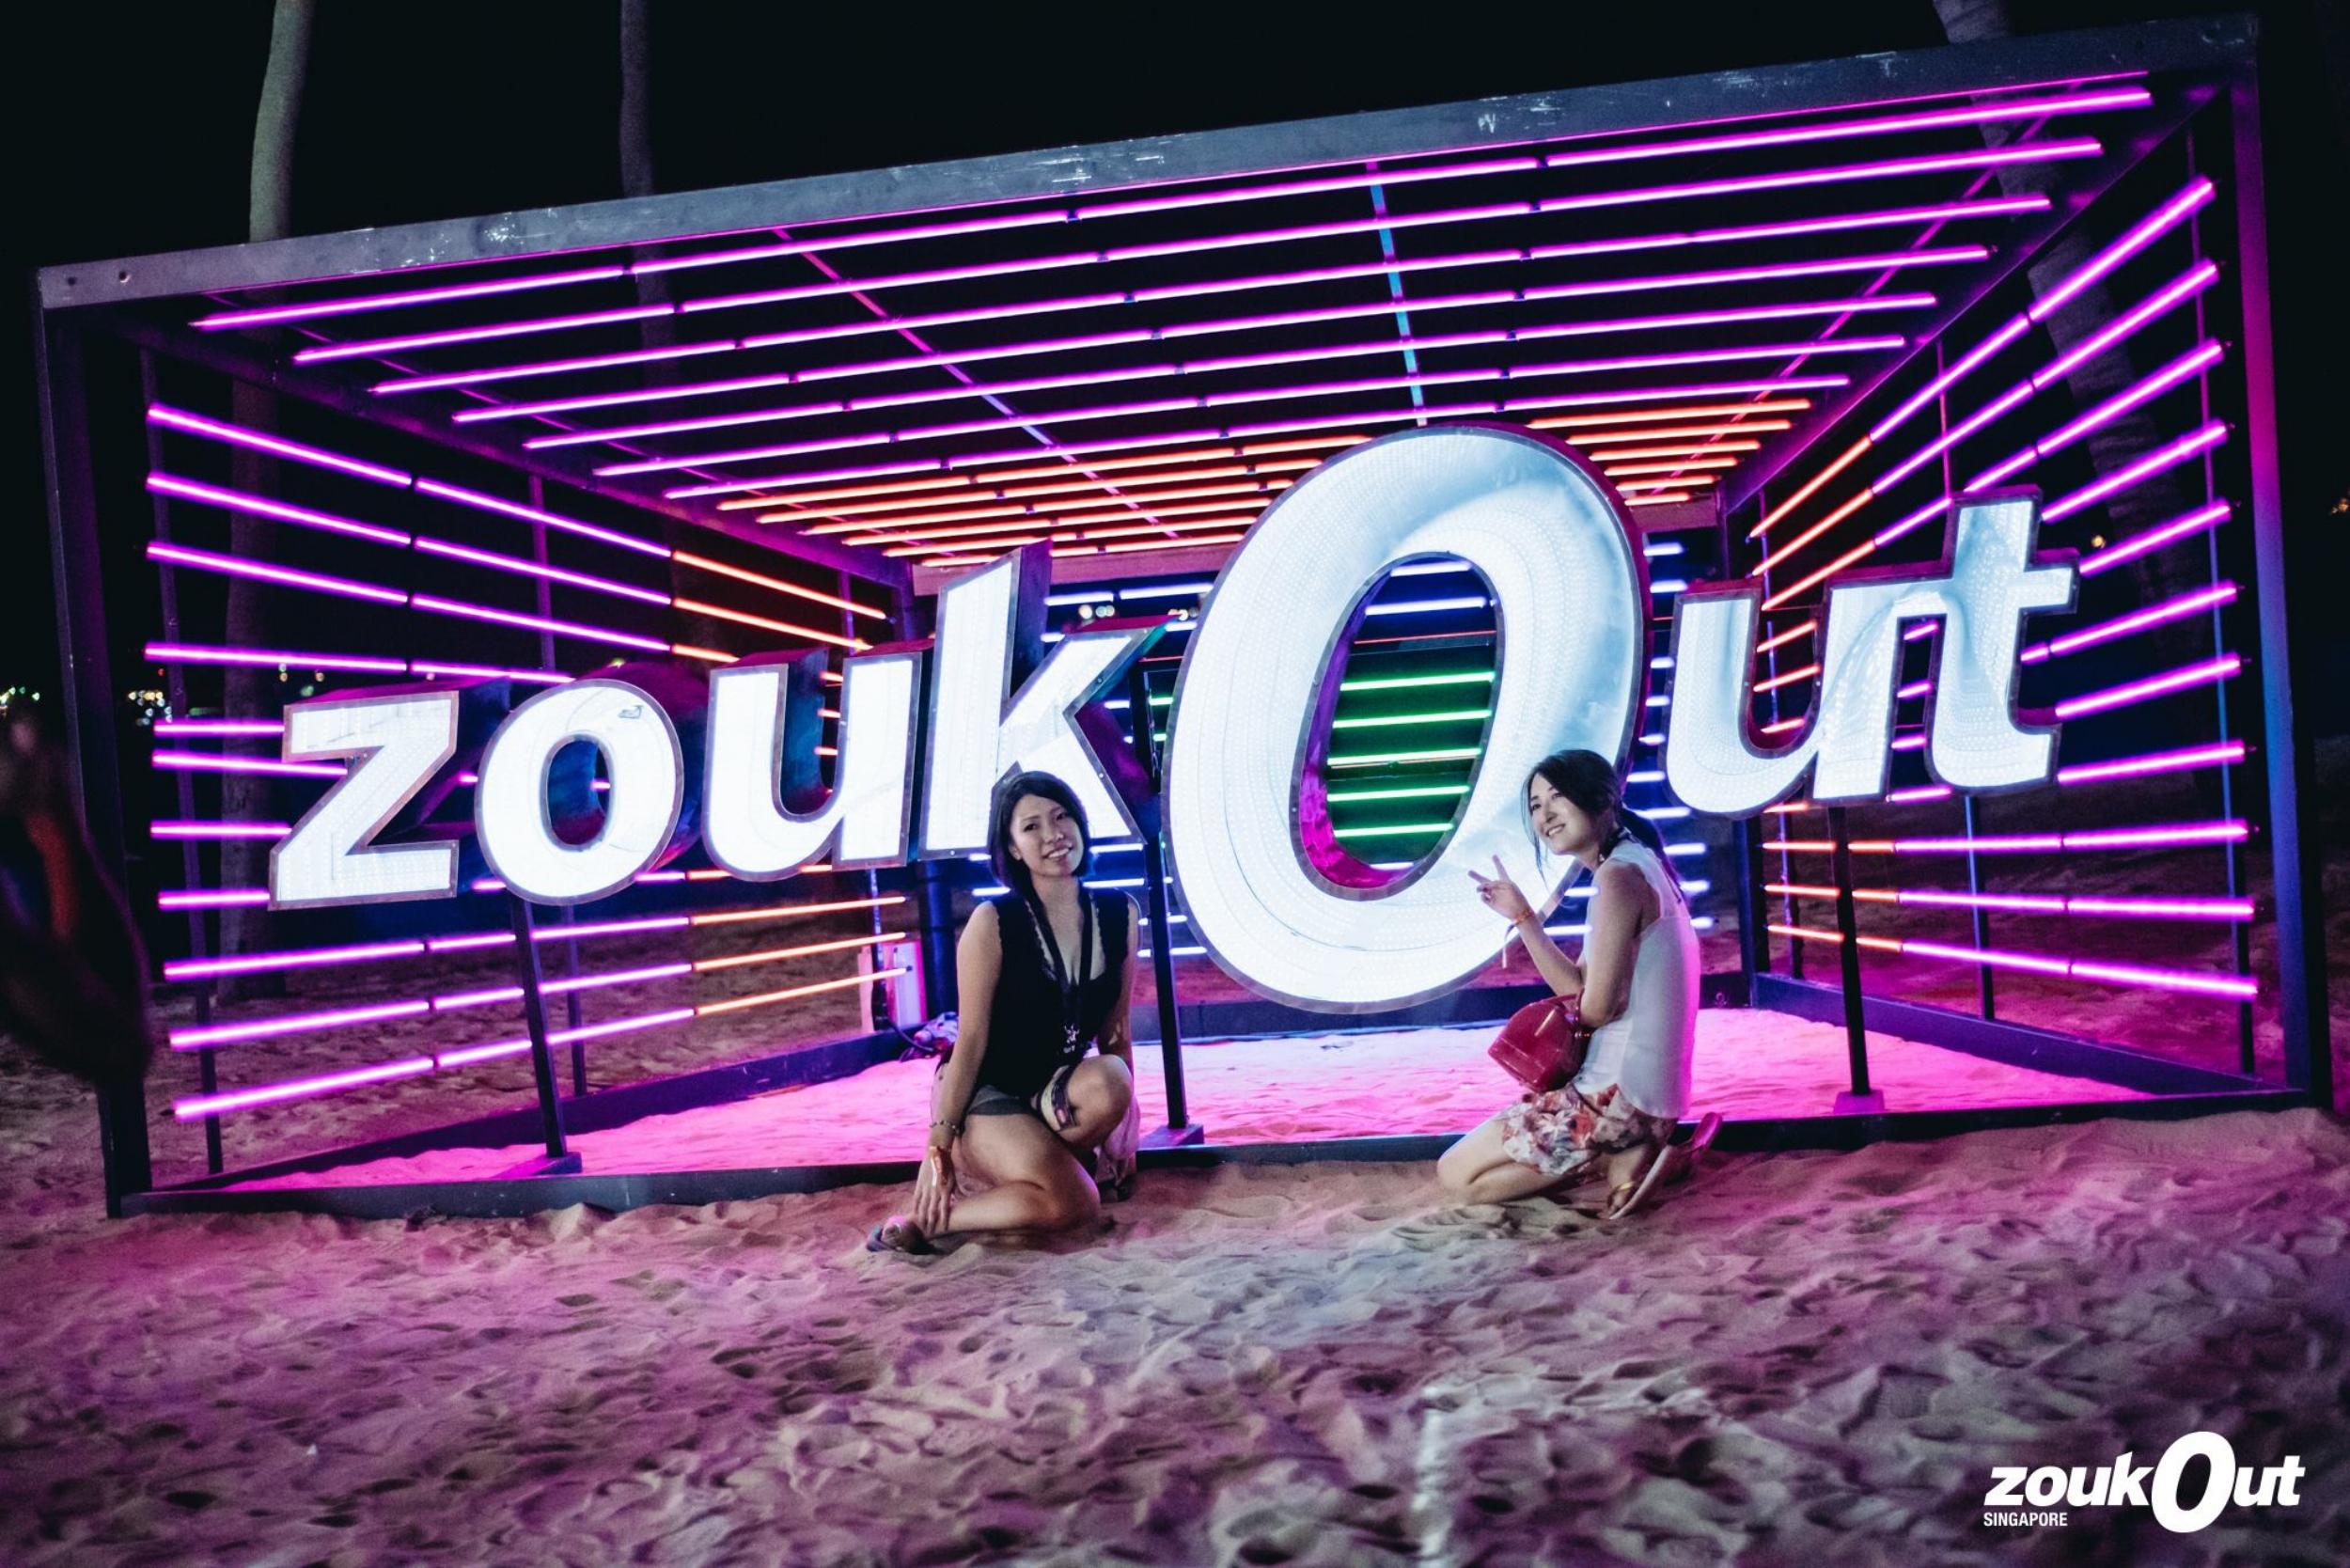 ZoukOut-3.jpg